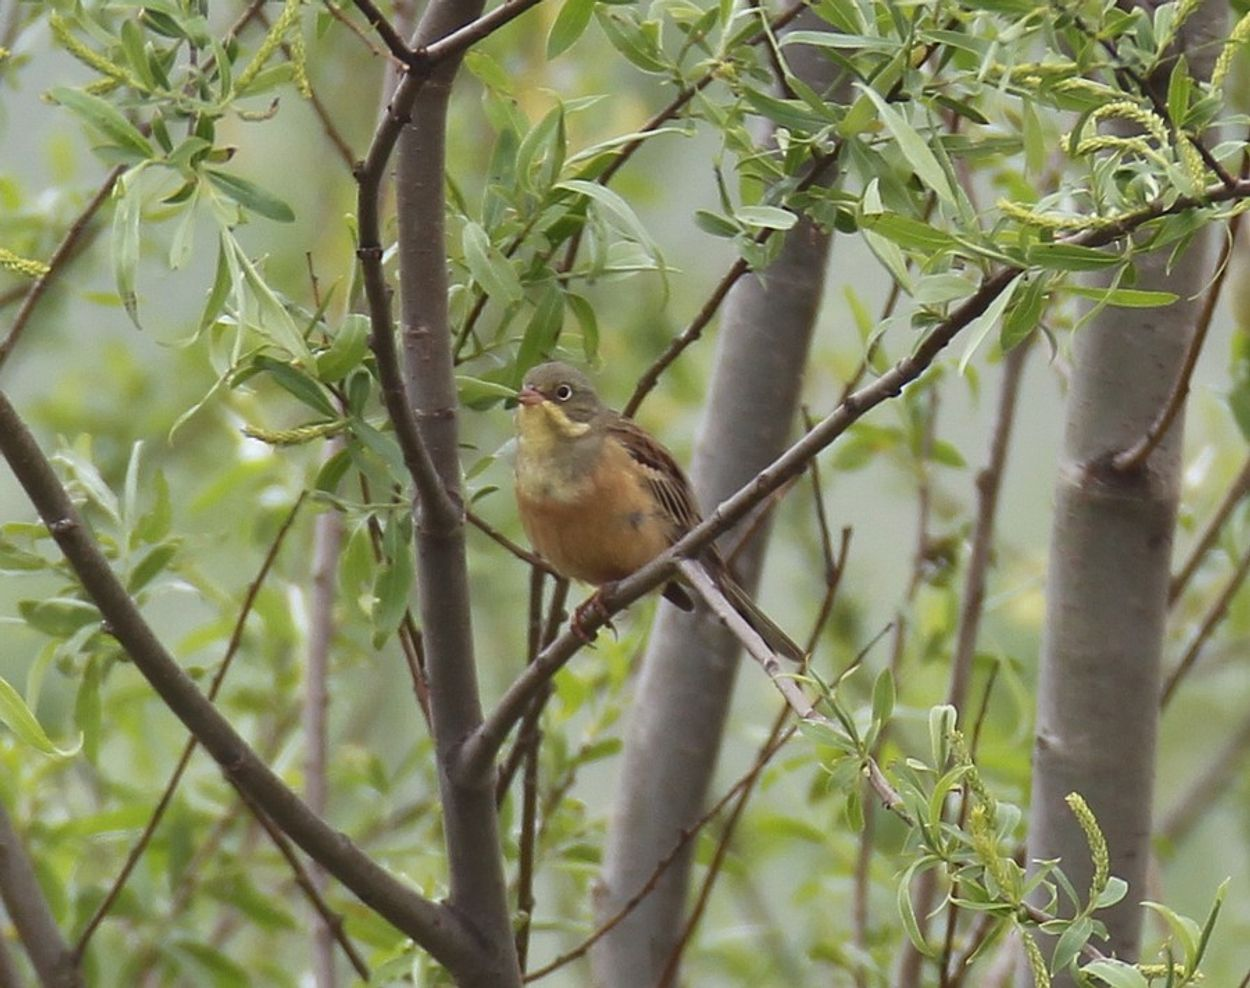 Afbeelding van Vogelbevolking Achterhoek sterk veranderd